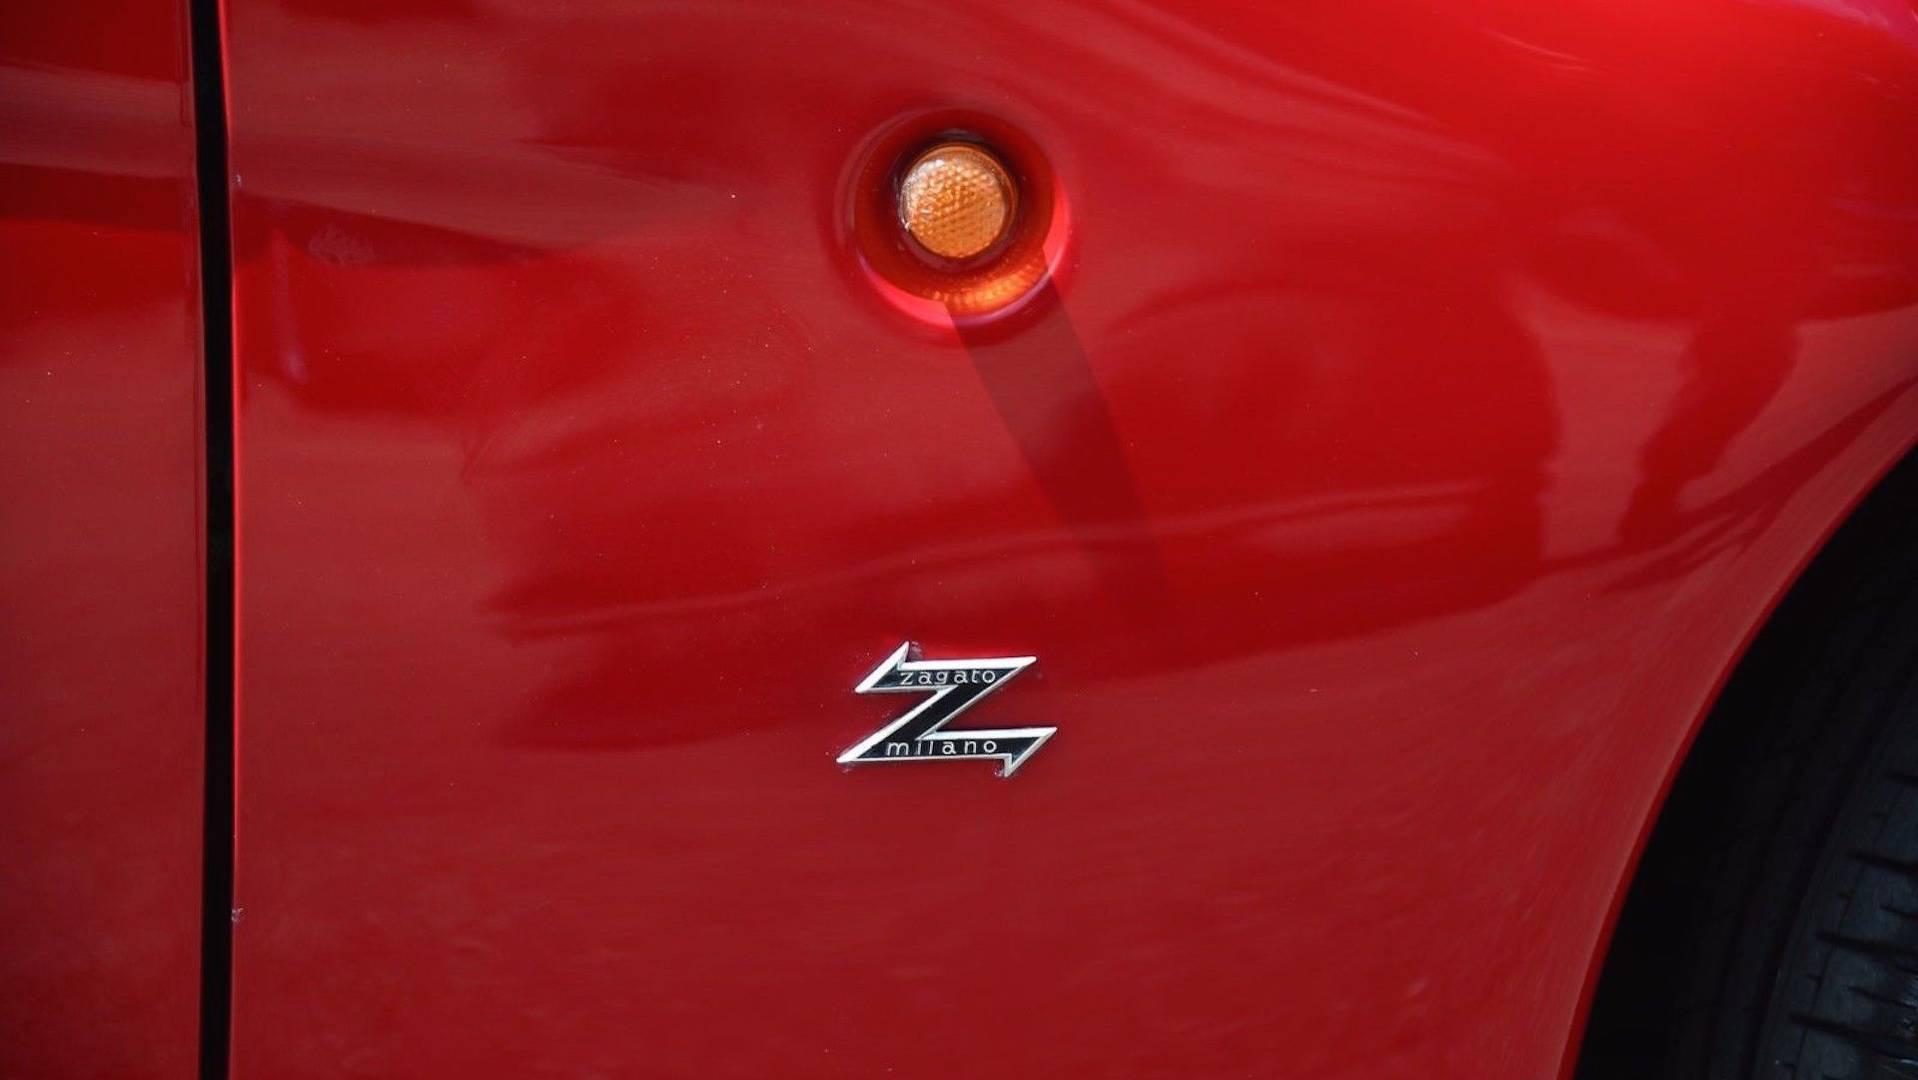 1990 Alfa Romeo SZ eBay Find Is A Beautiful Monster